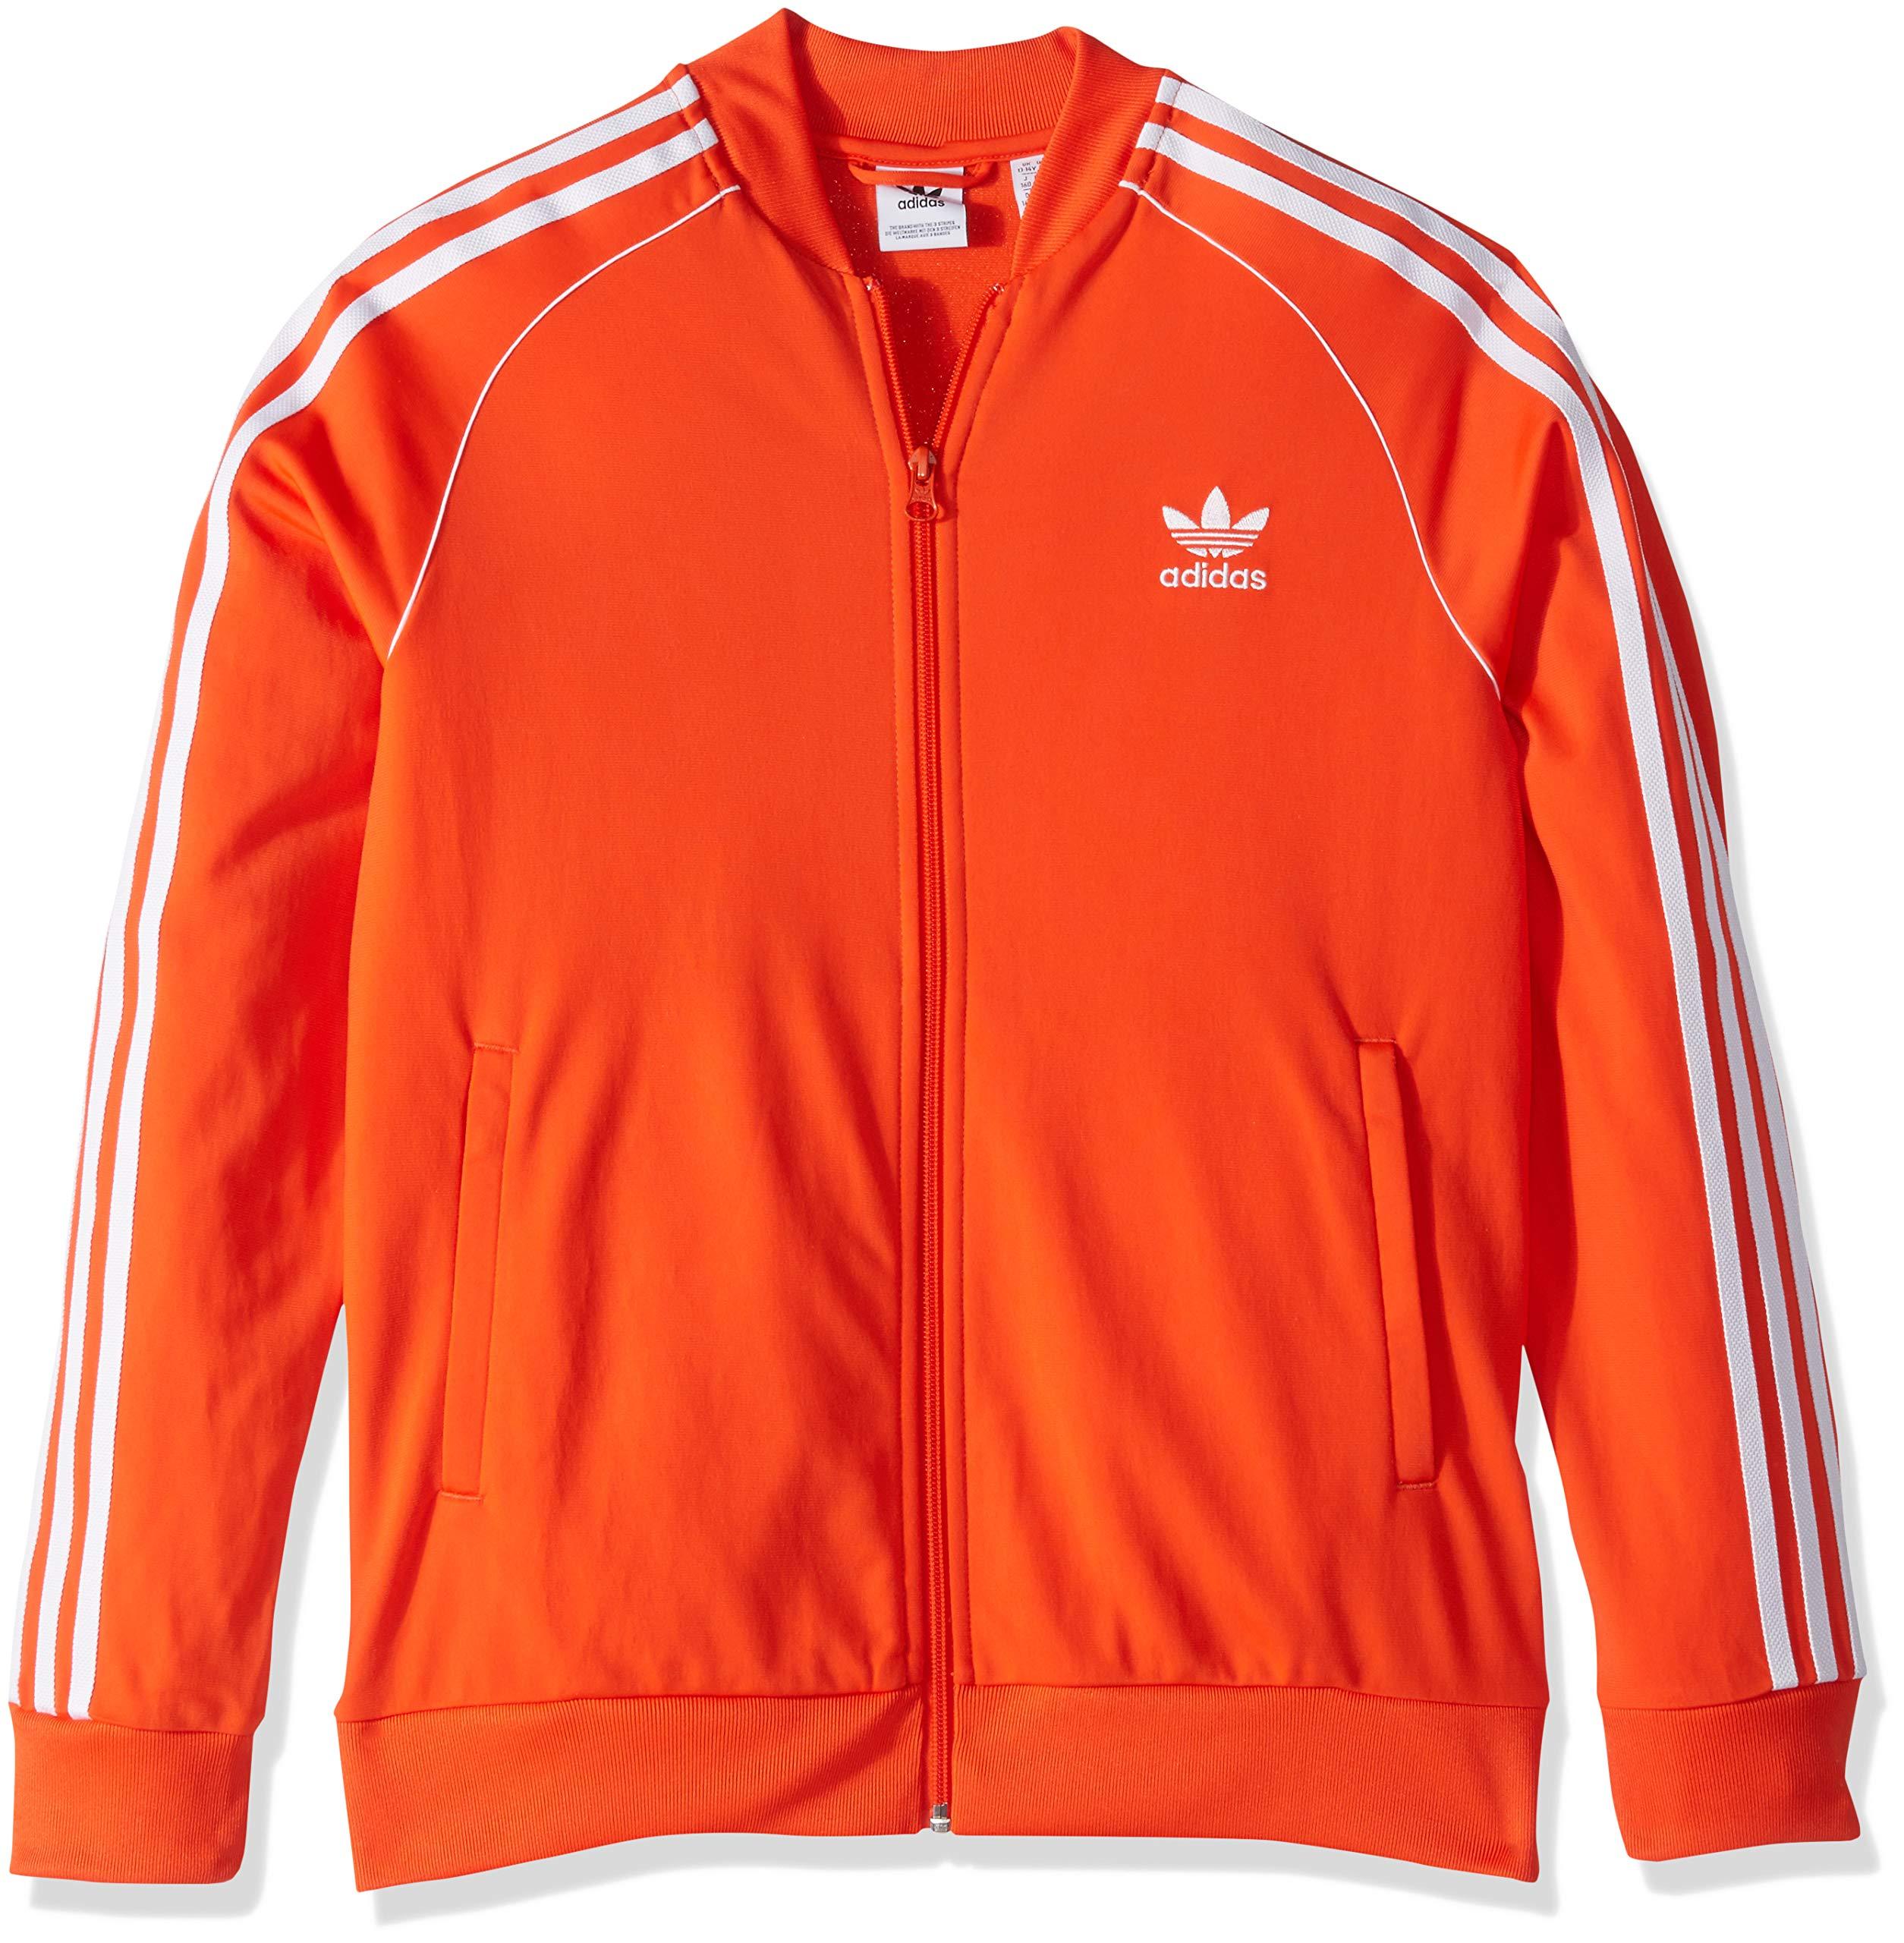 adidas Originals Boys' Big Superstar Jacket, active orange/white, Large